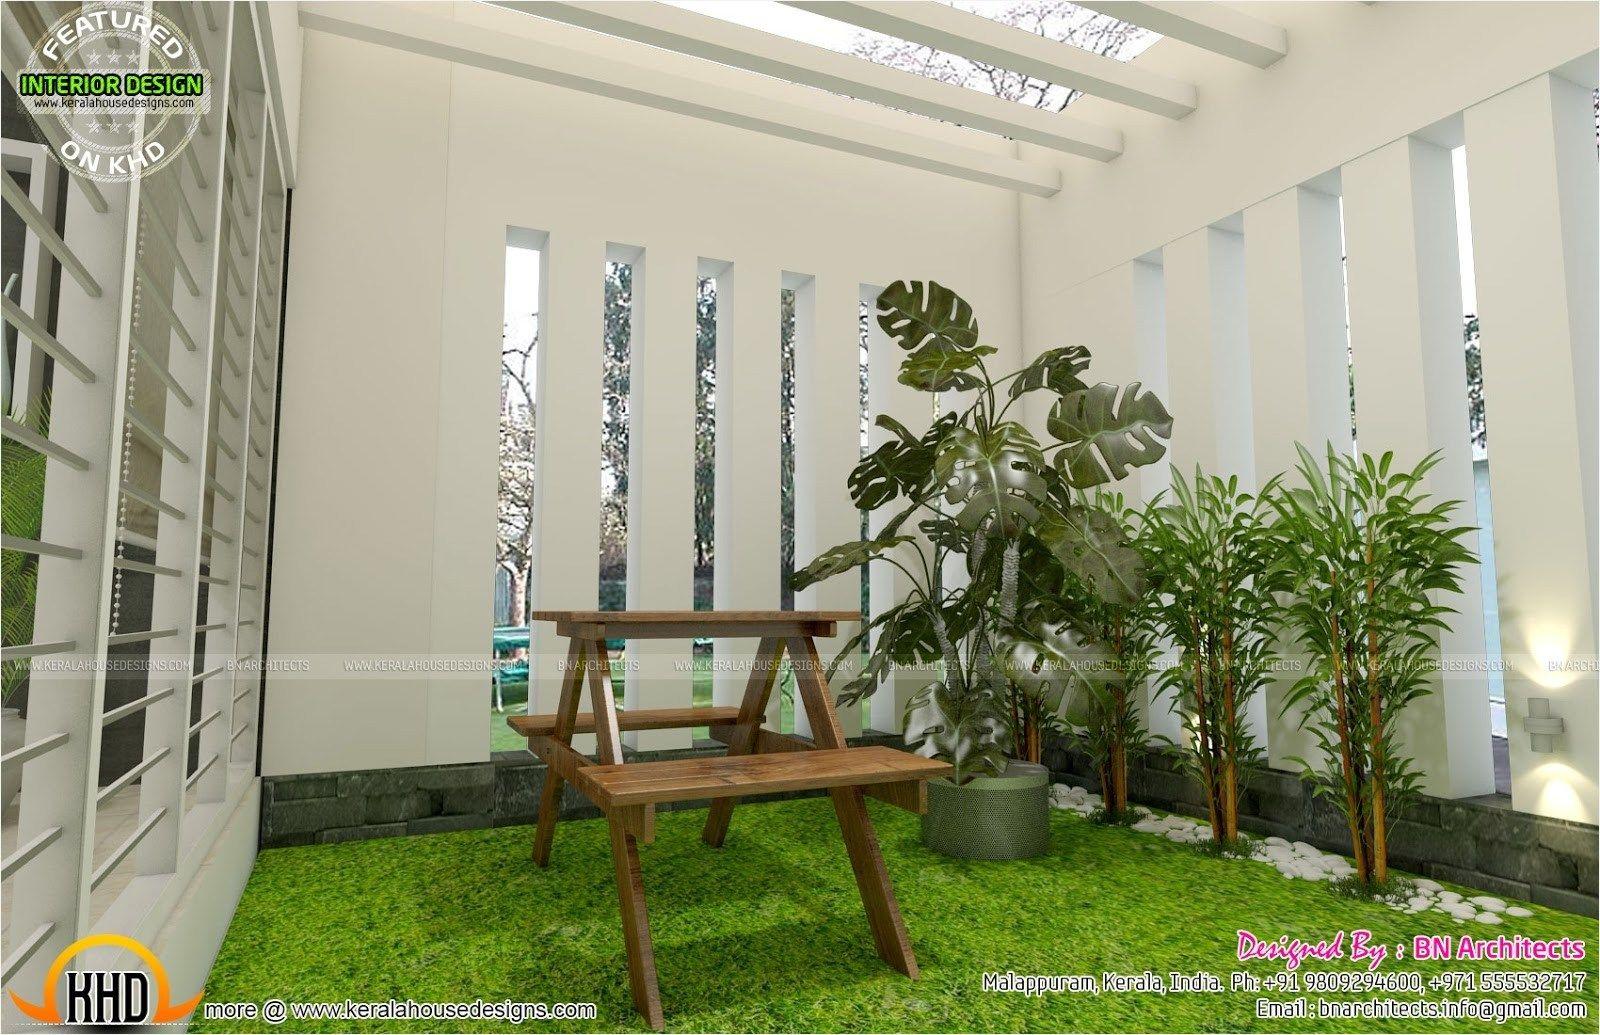 Stunning Courtyard Interior Wall Decorating Ideas Decorecord Kerala House Design House Front Design Courtyard House